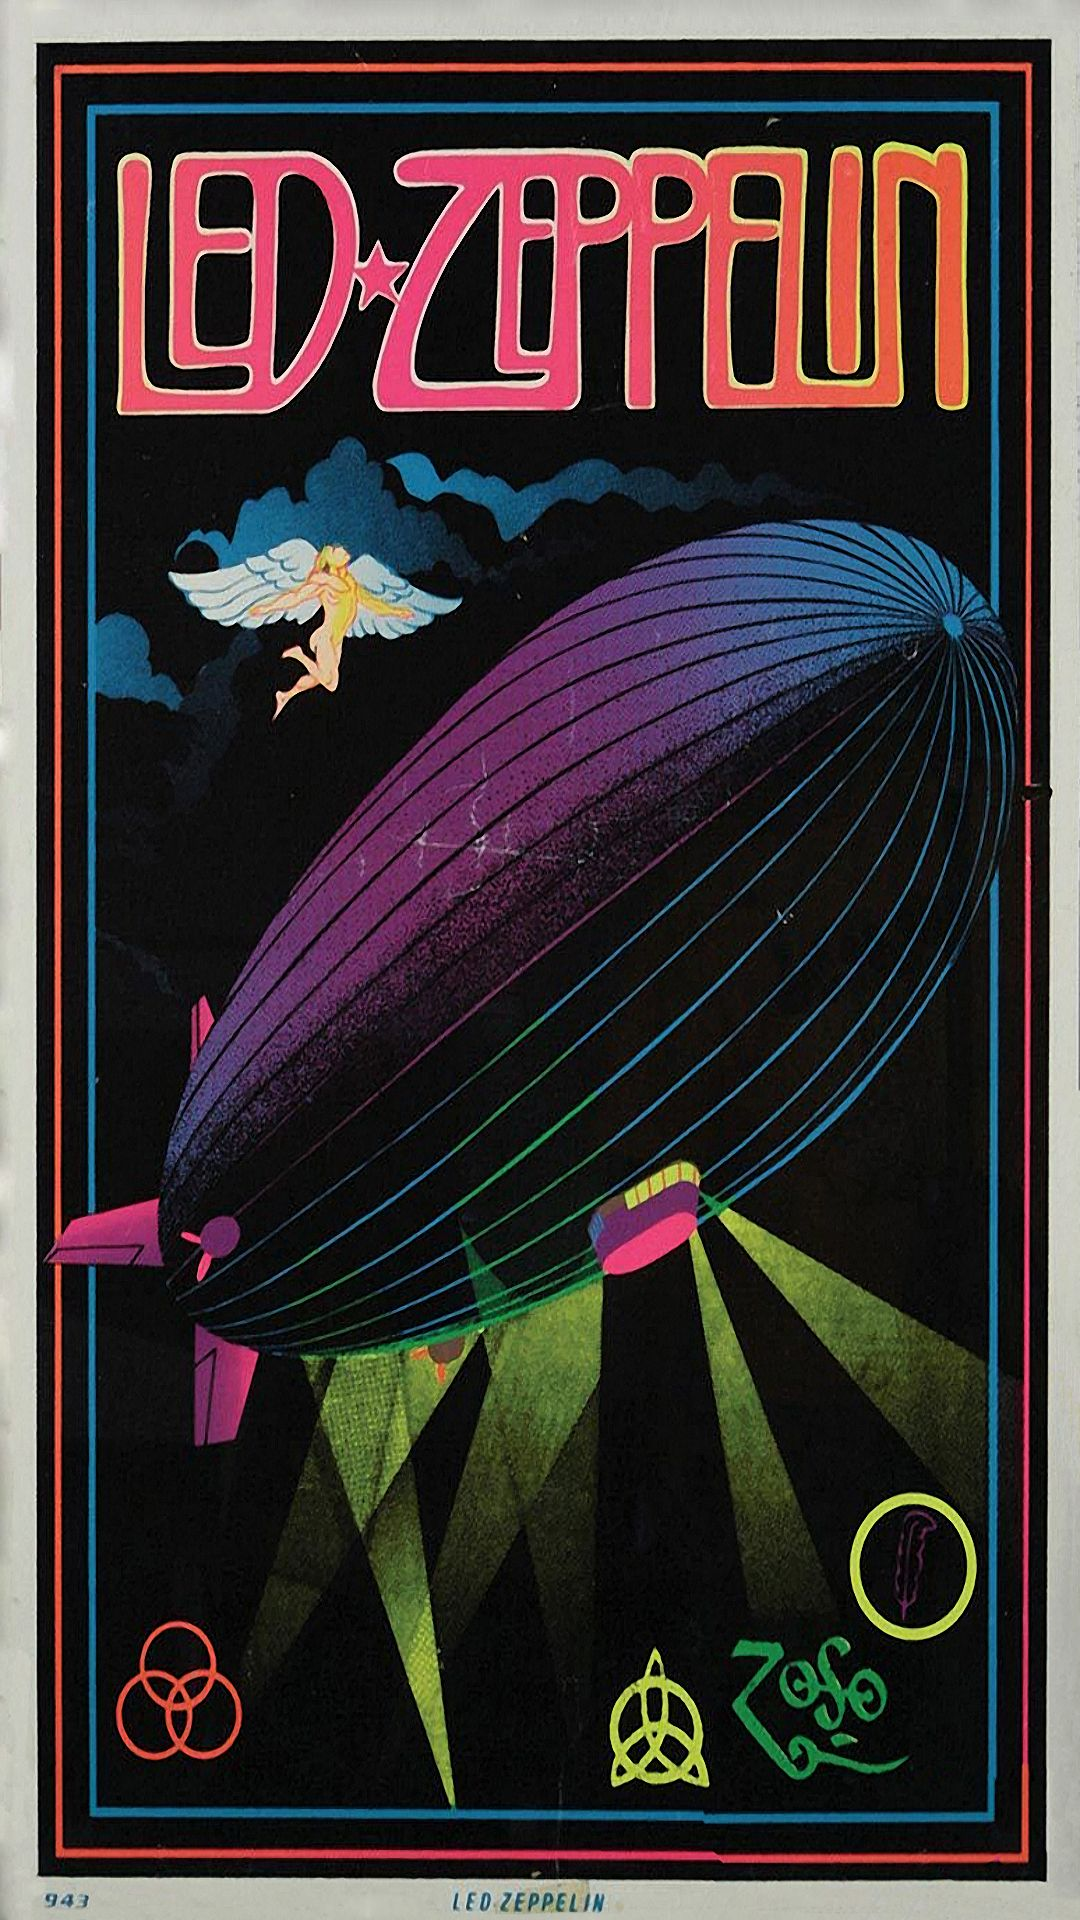 Led Zeppelin Wallpapers - Top Free Led Zeppelin ...